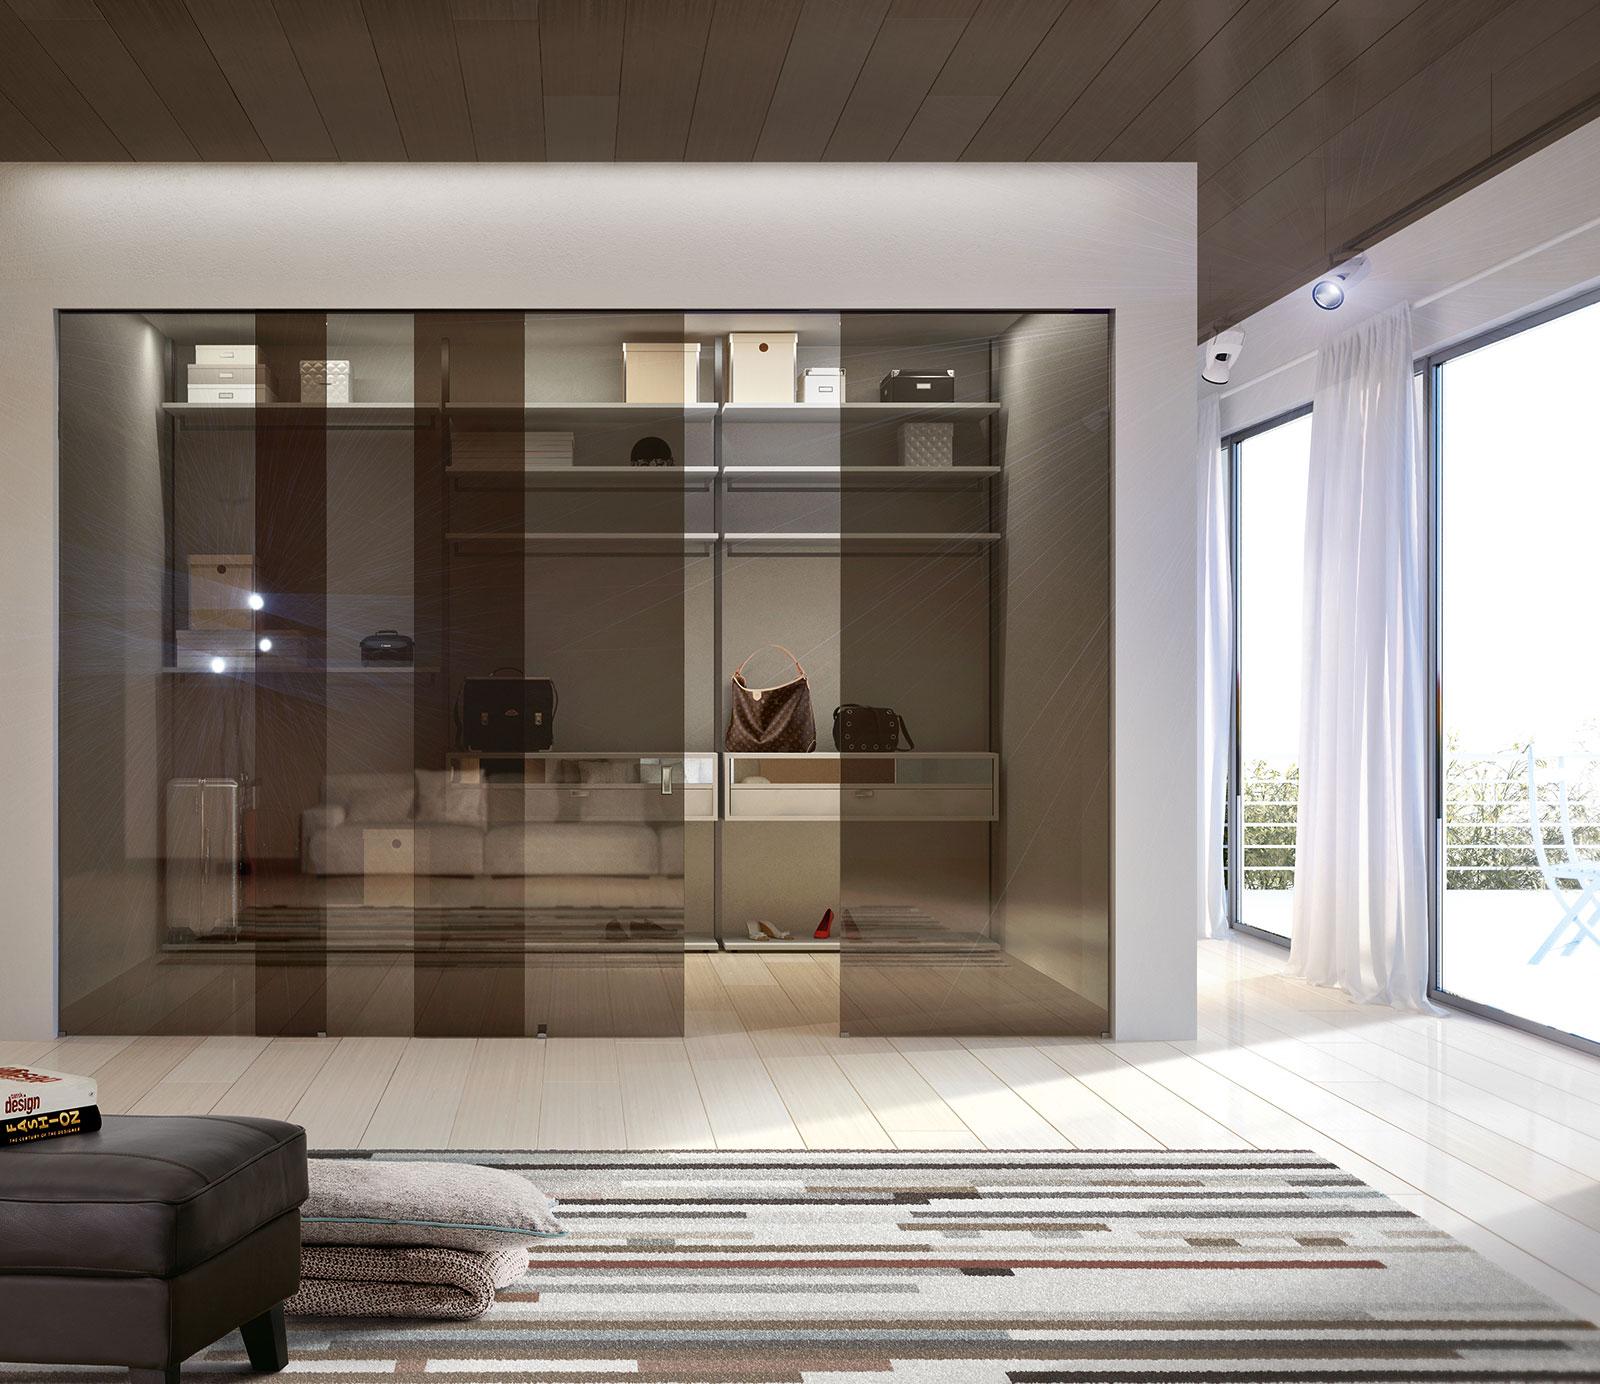 Bronze Reflective Clear Glass Sliding Doors, Built In Sliding System